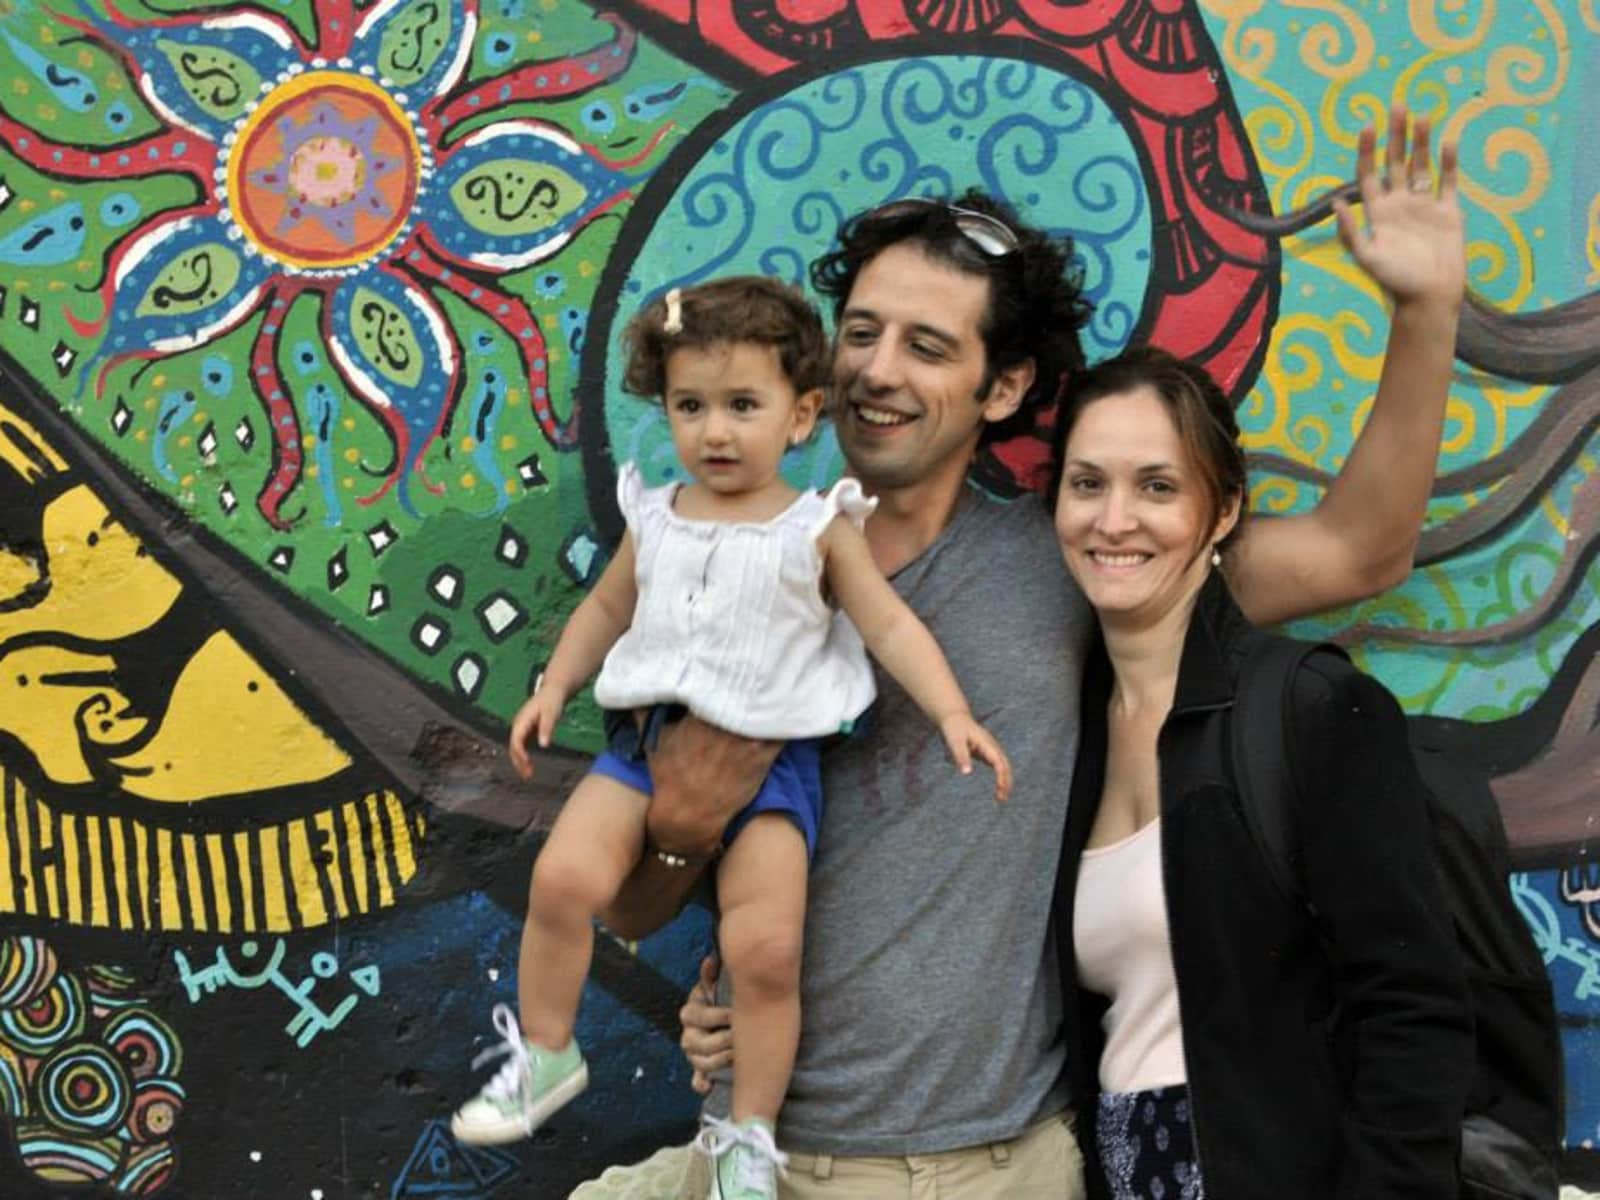 Gerardo & Isalis from San Juan, Puerto Rico